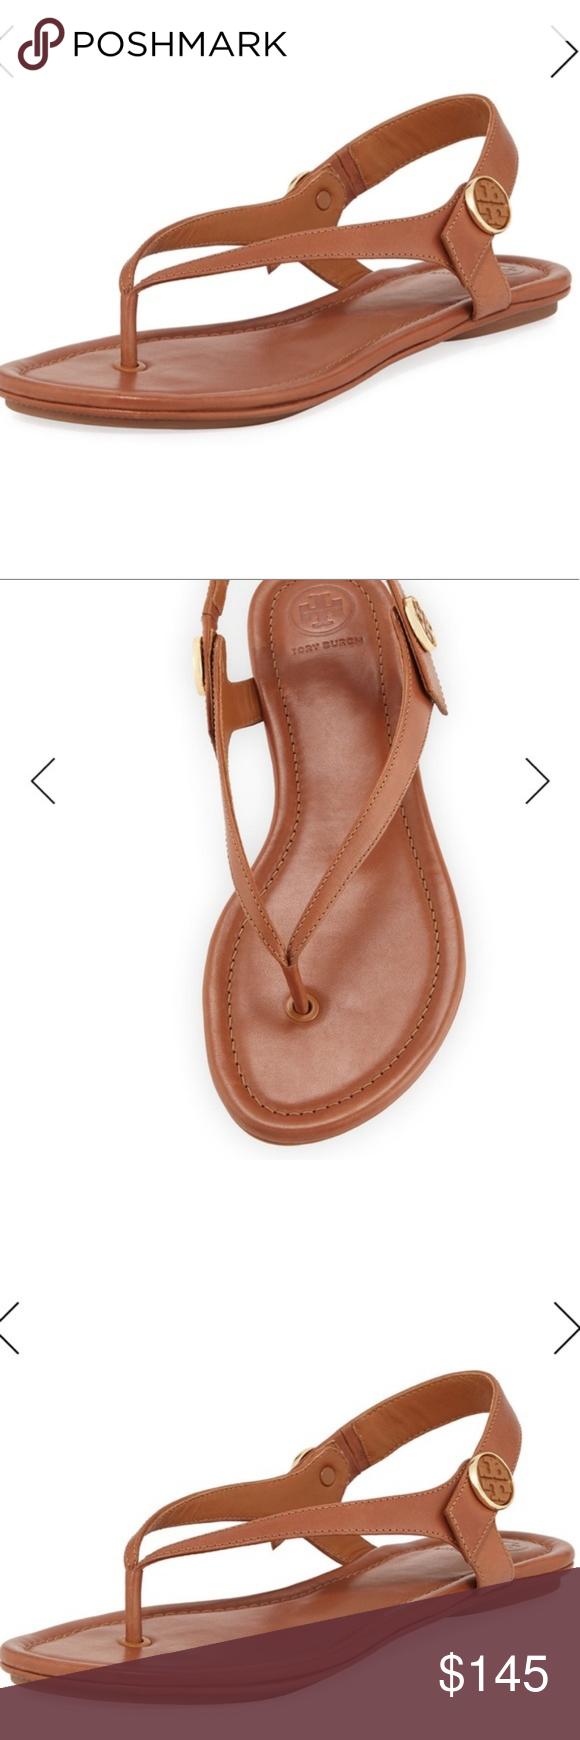 b512000b299a Tory Burch Minnie travel leather sandals Sz 10 NWT Tory Burch Minnie travel  leather sandals royal